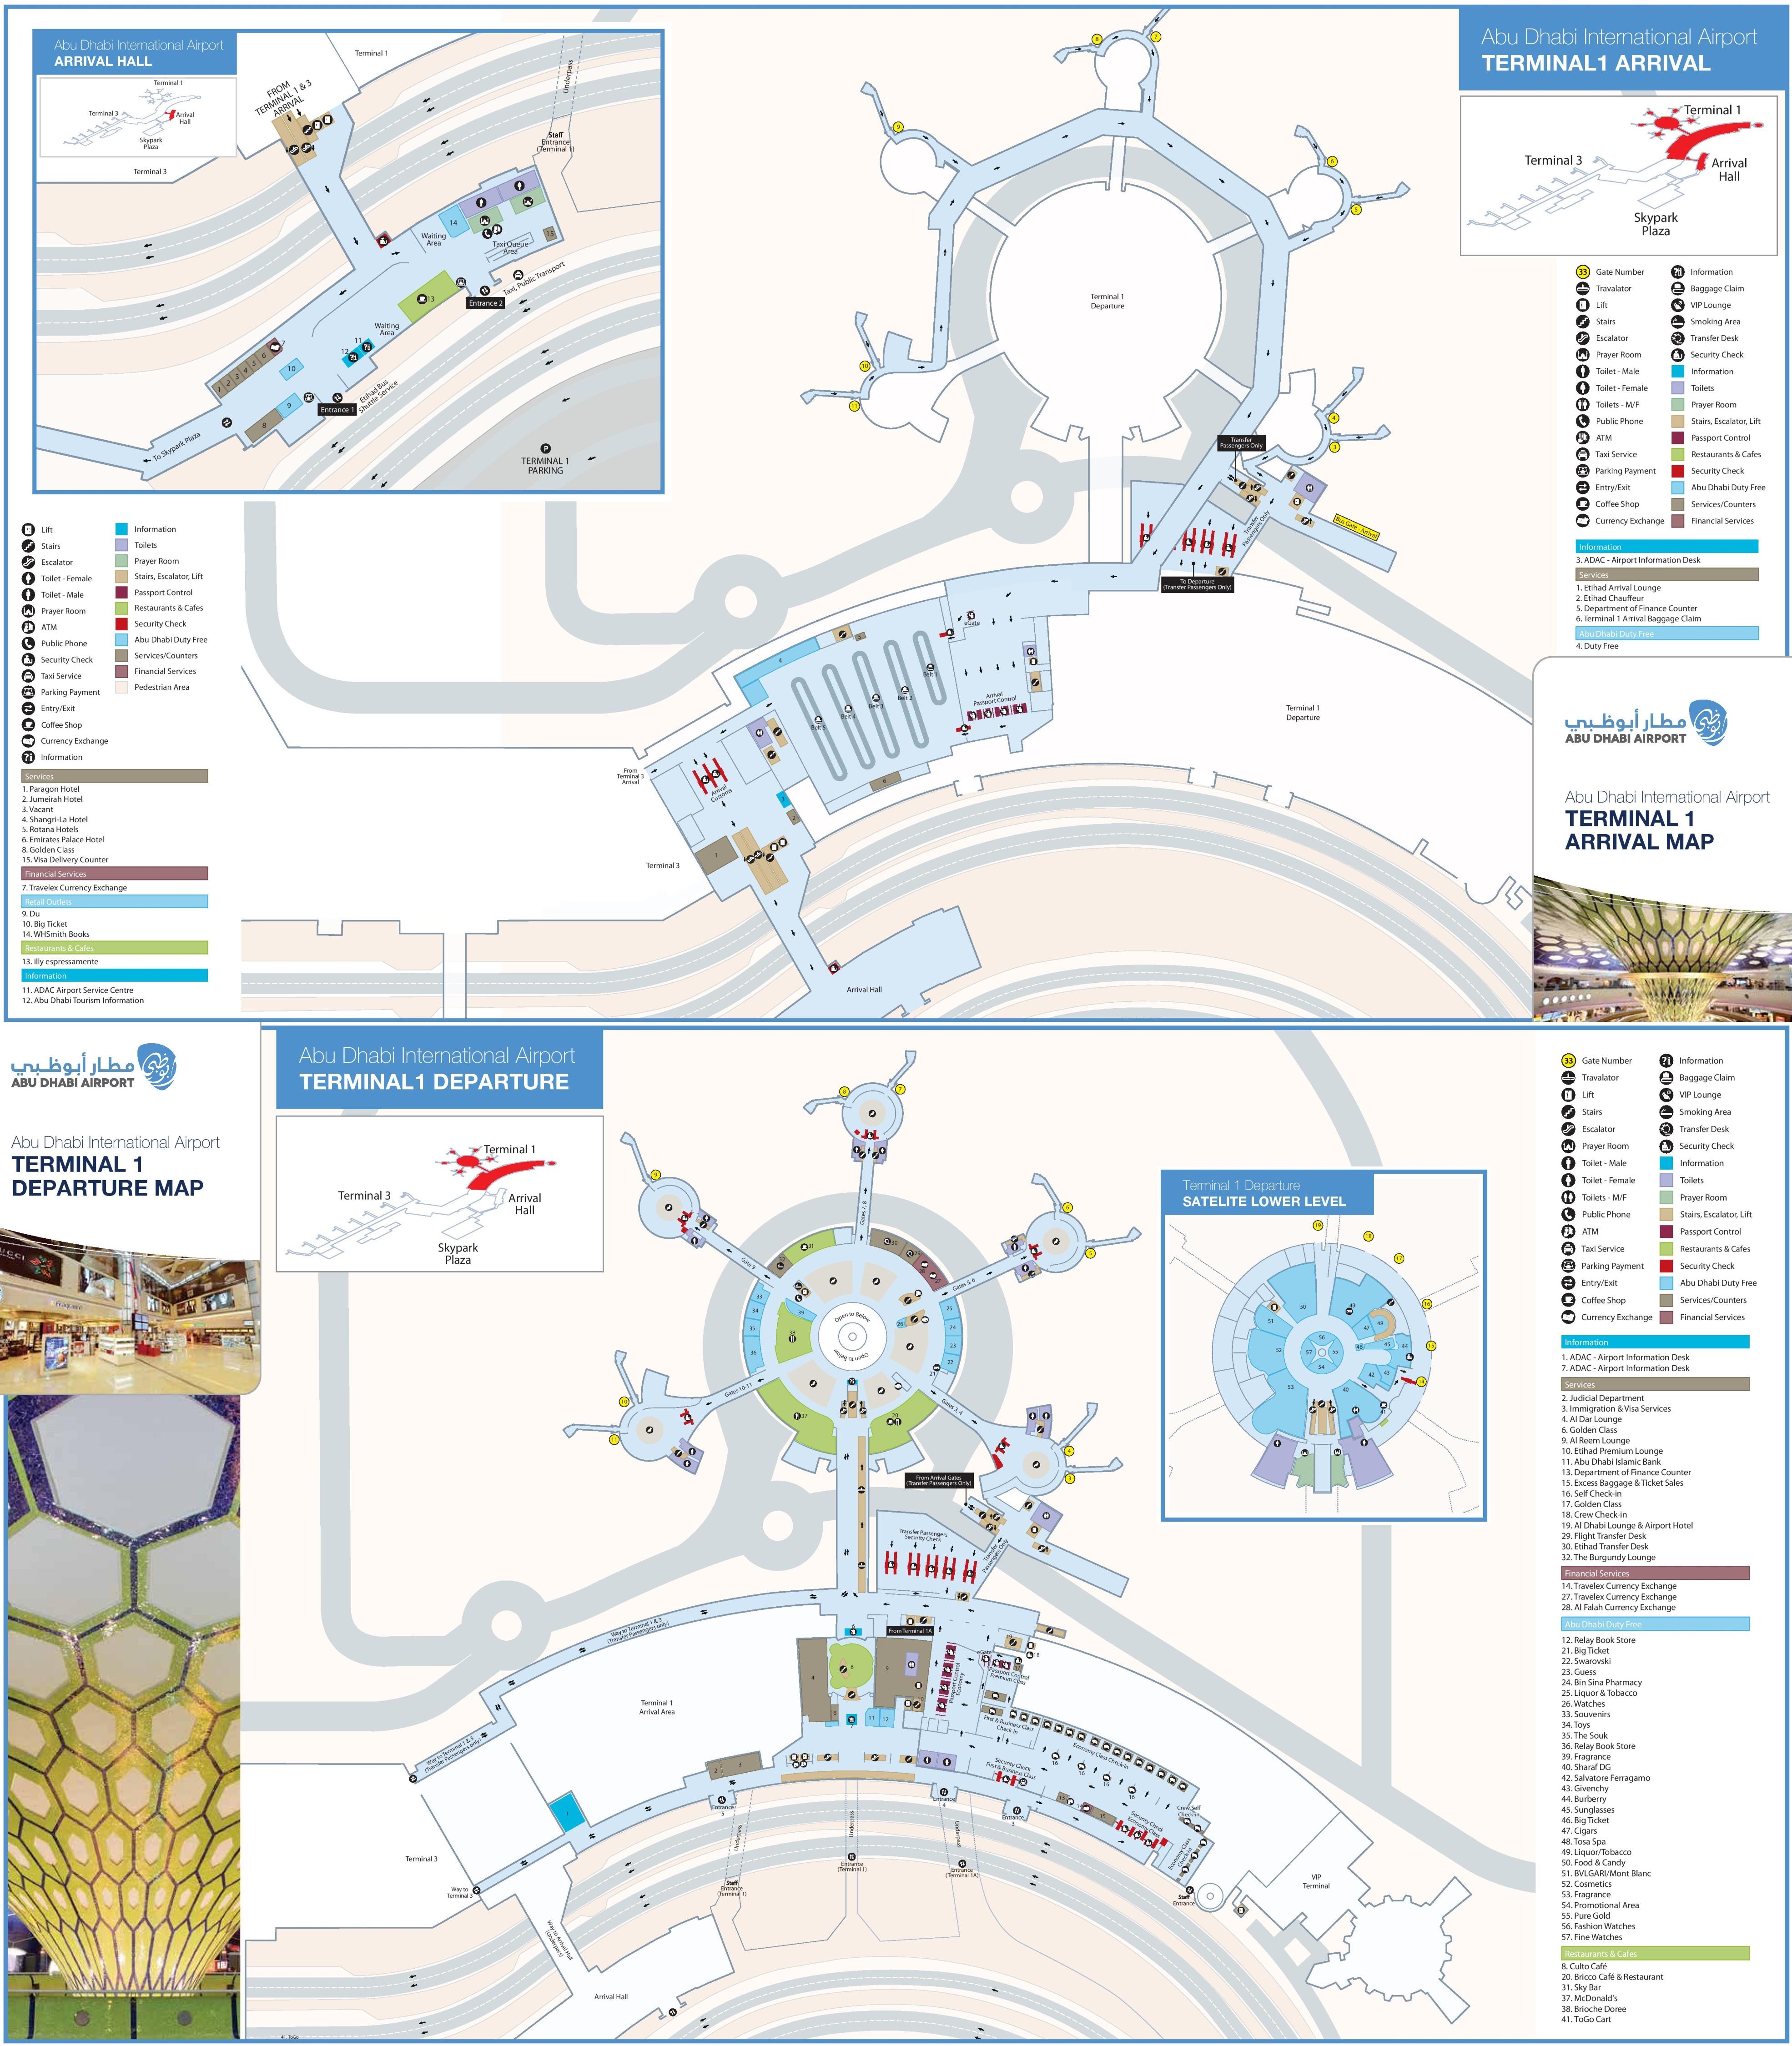 abu dhabi airport terminal 1 map